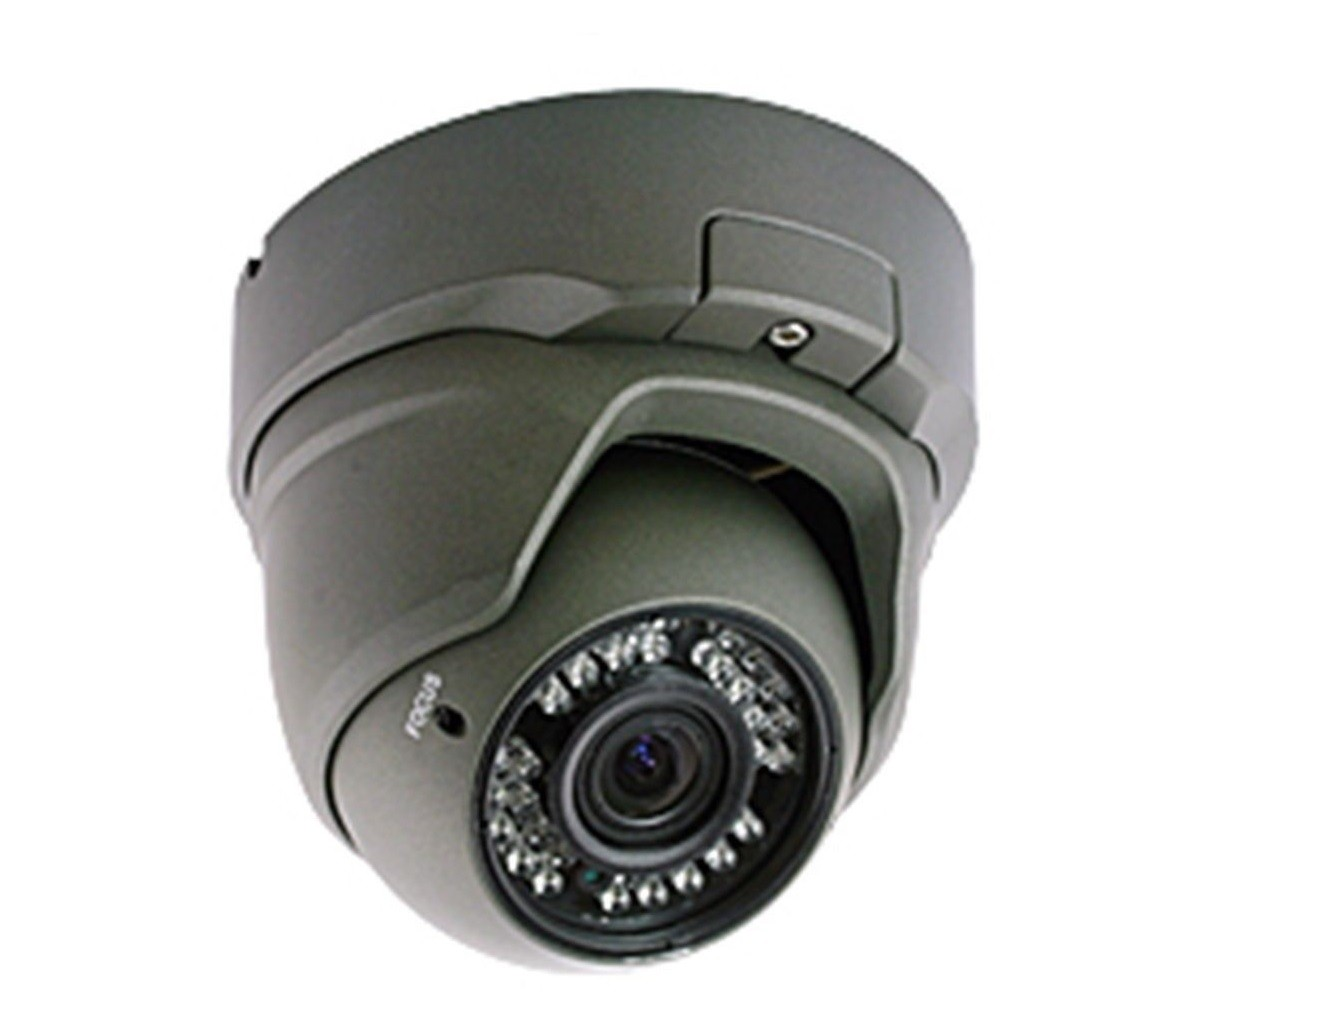 Ertech Sony IMX 2MP 2.8-12MM 1080P ONVIF P2P 30M POE Audio Outdoor Dome IP Camera CCTV